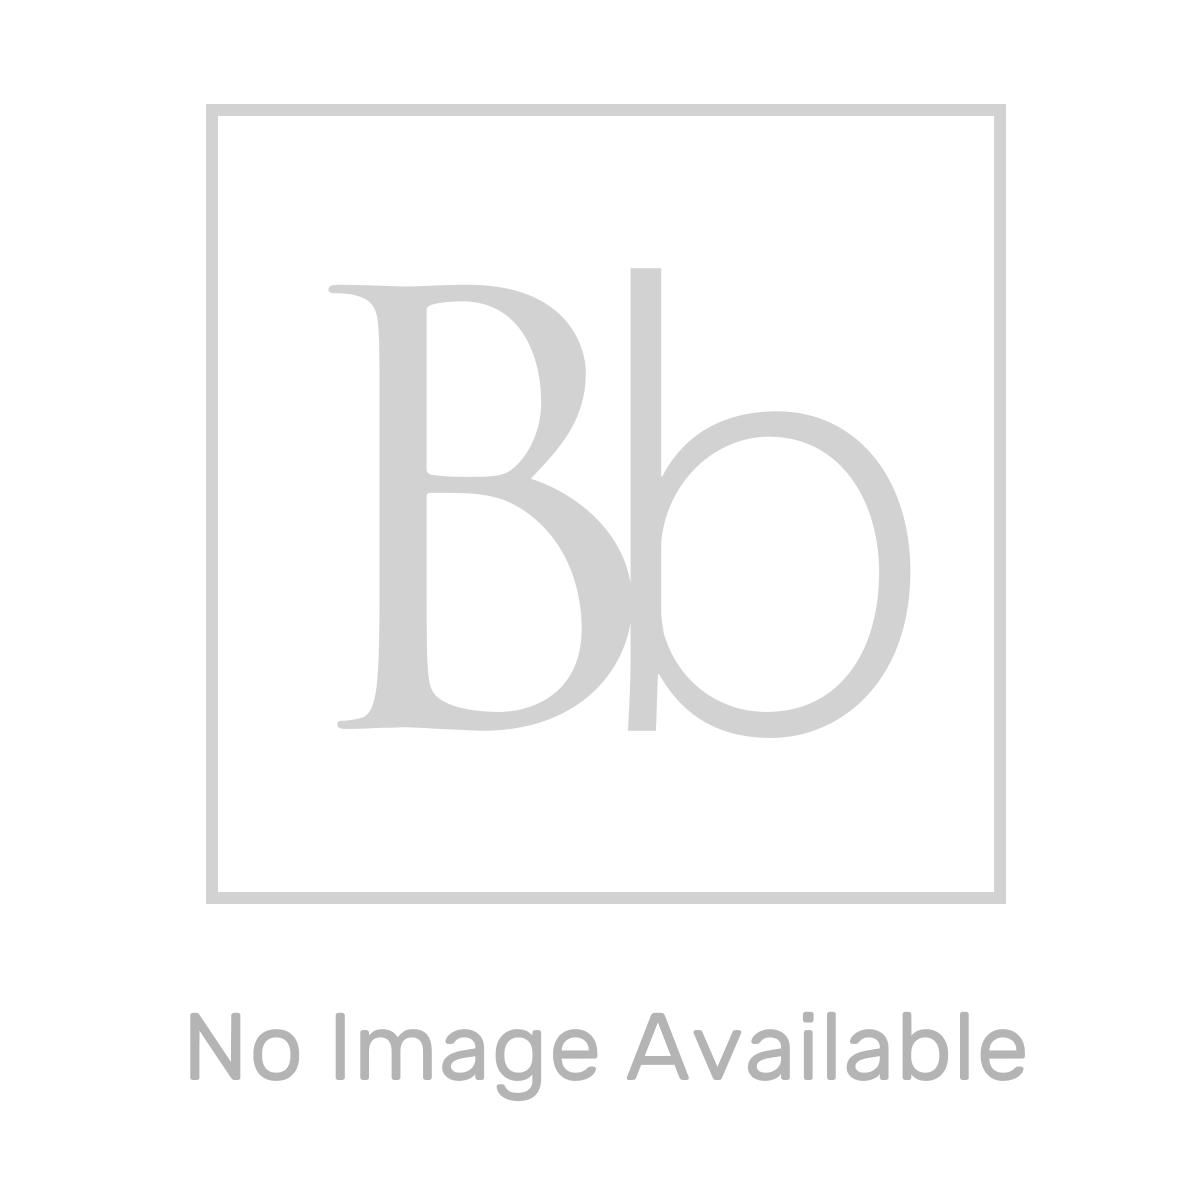 RAK Surface Matt Ash Tile 600 x 600mm Lifestyle